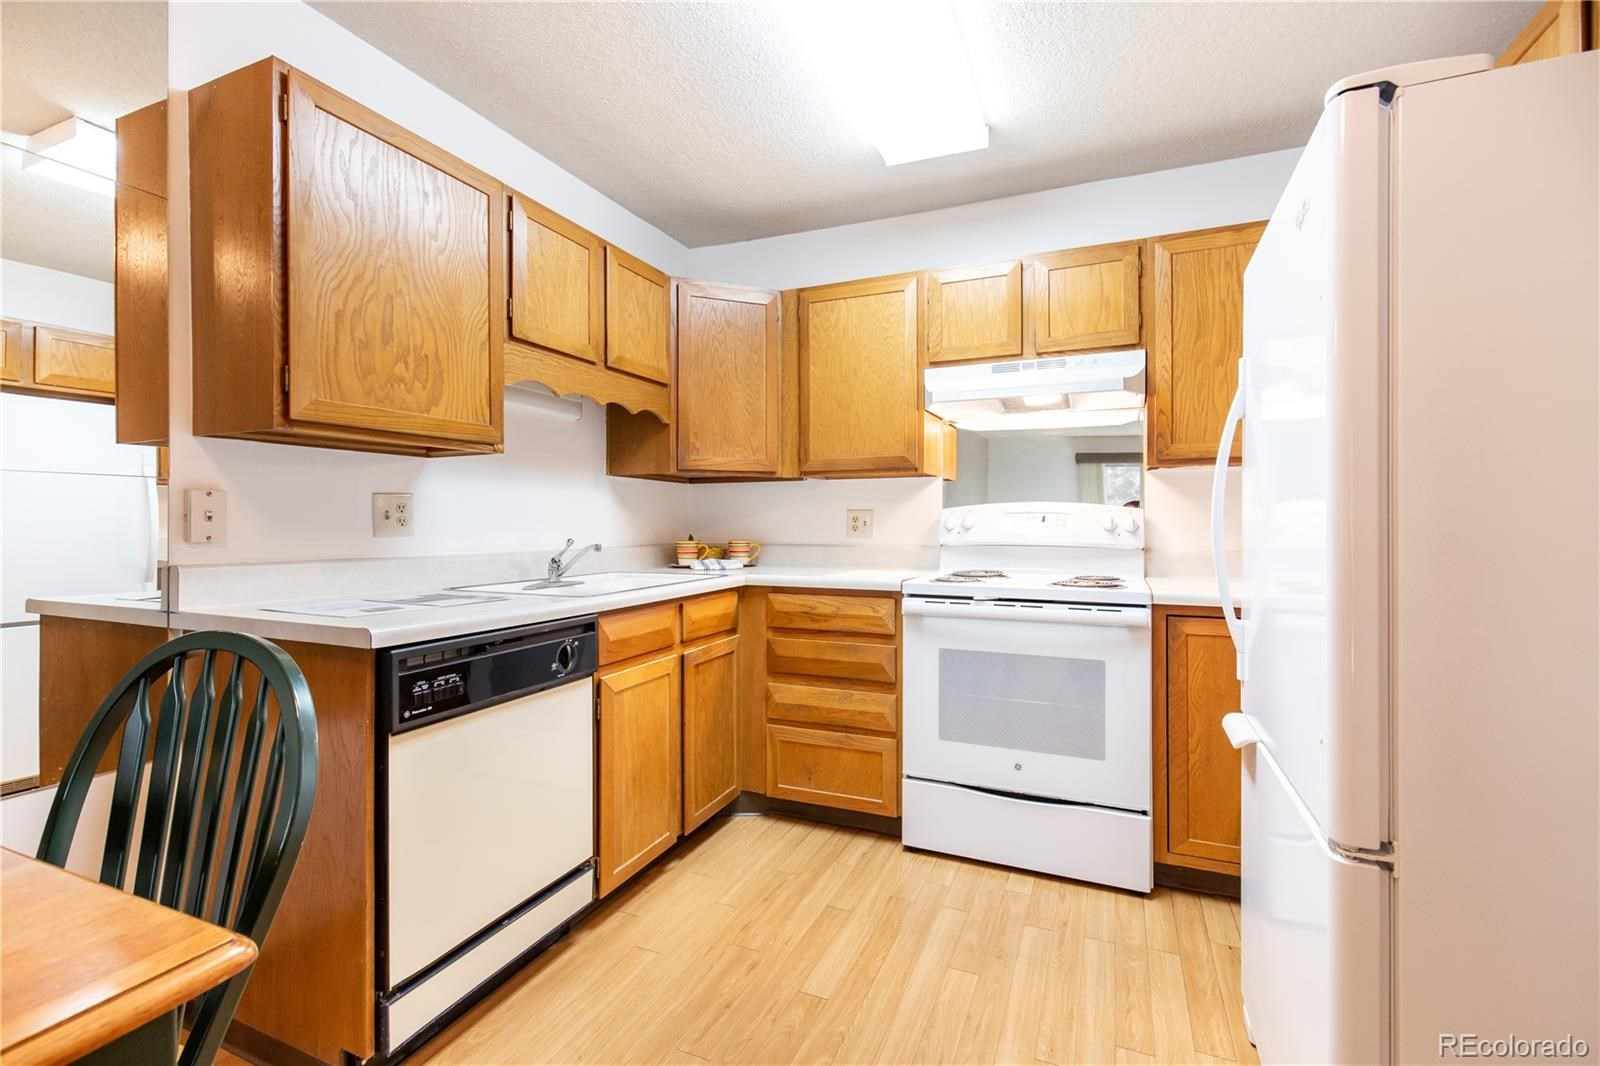 MLS# 8258925 - 3 - 13635 E Bates Avenue #207, Aurora, CO 80014